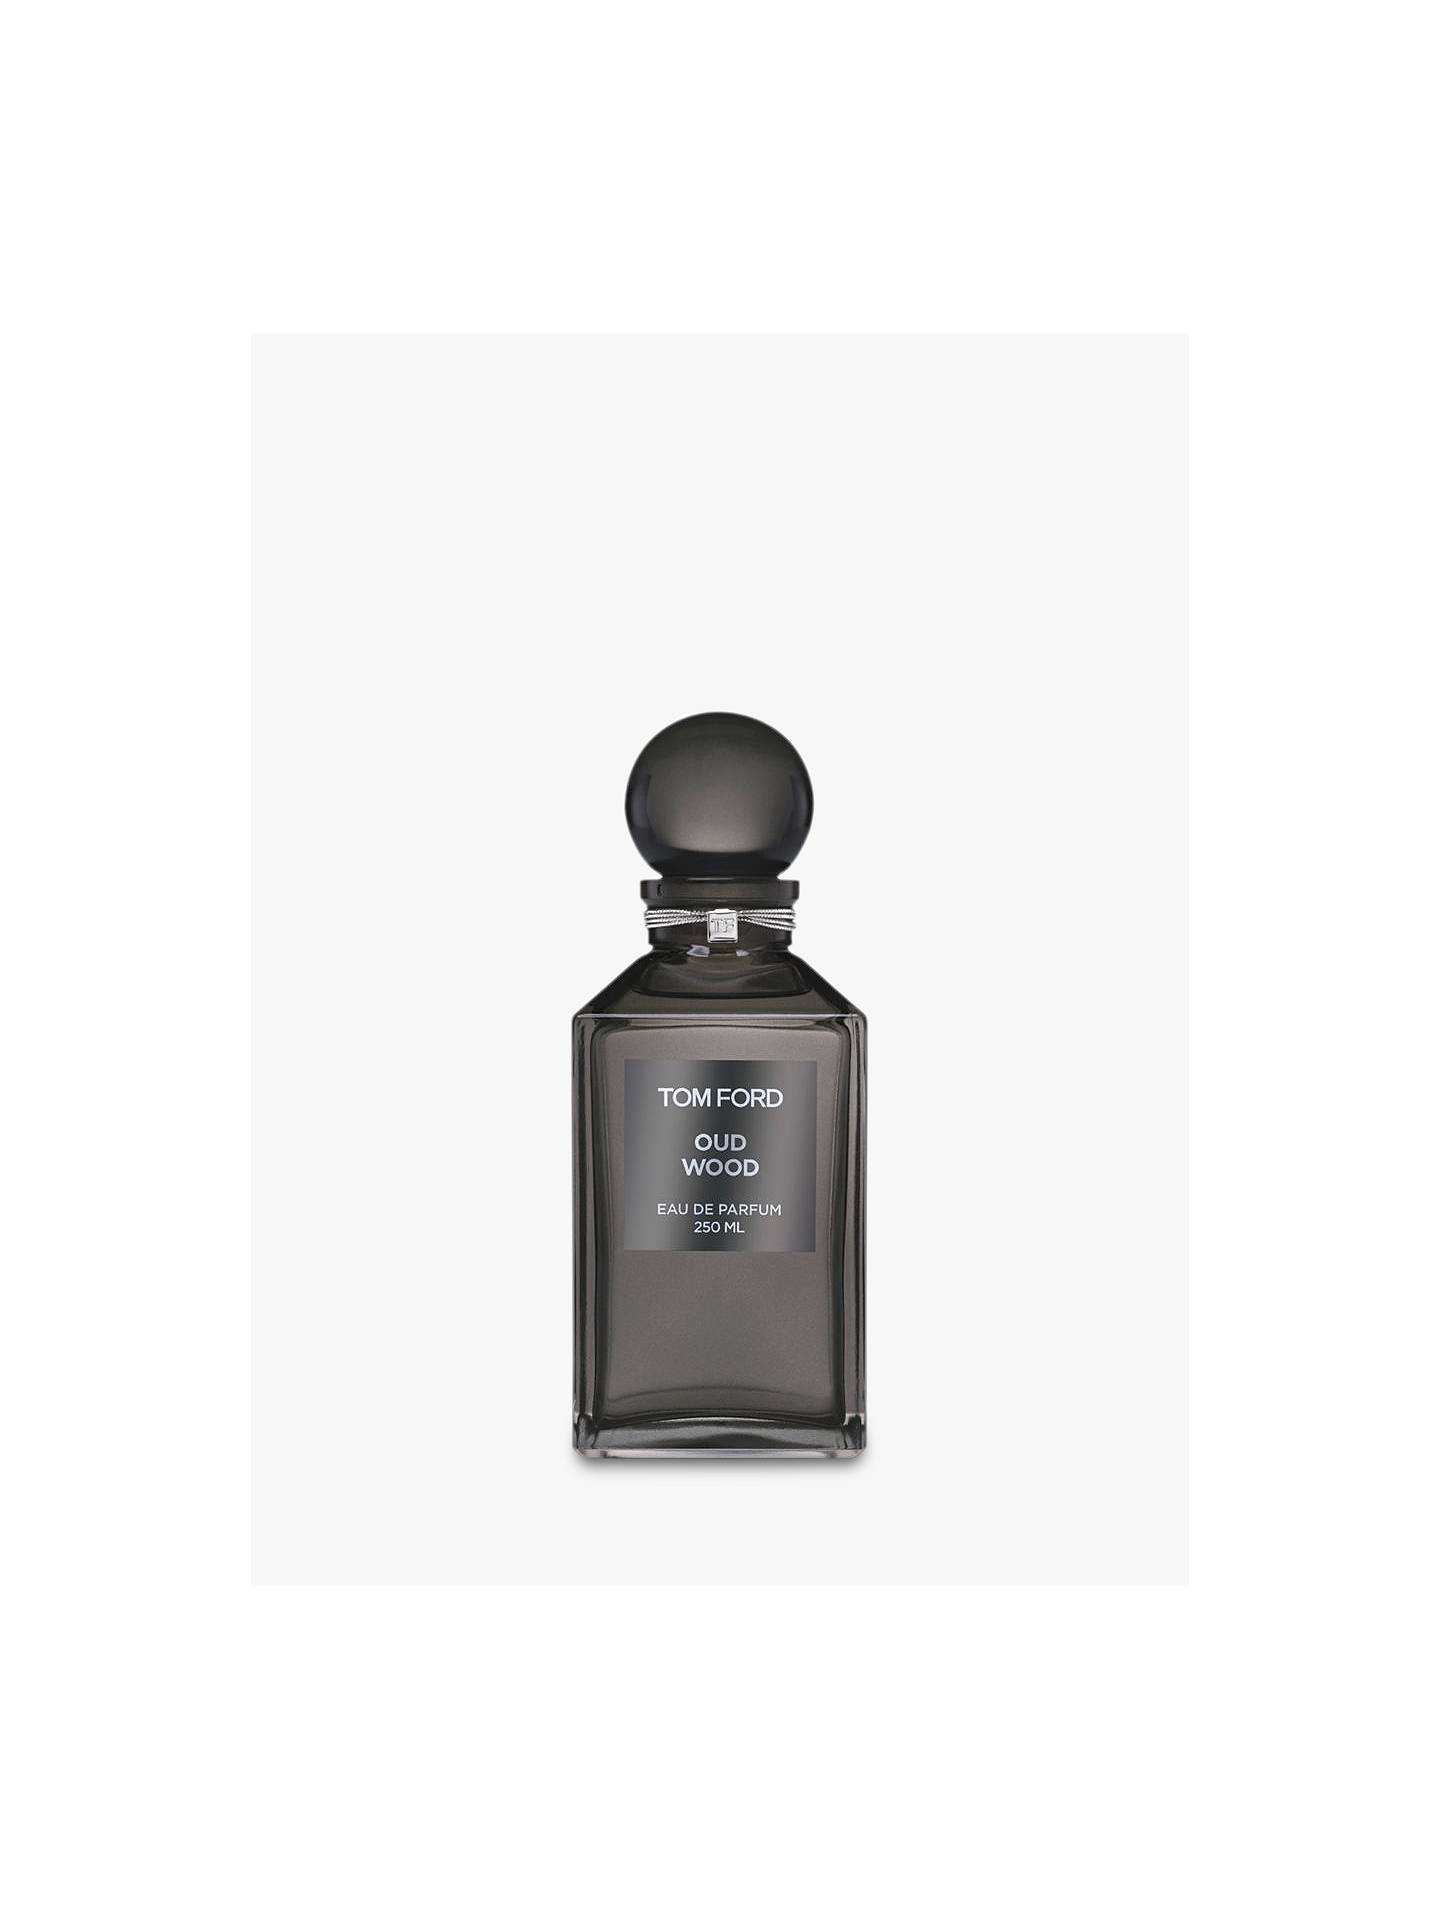 Tom Ford Private Blend Oud Wood Eau De Parfum 250ml At John Lewis